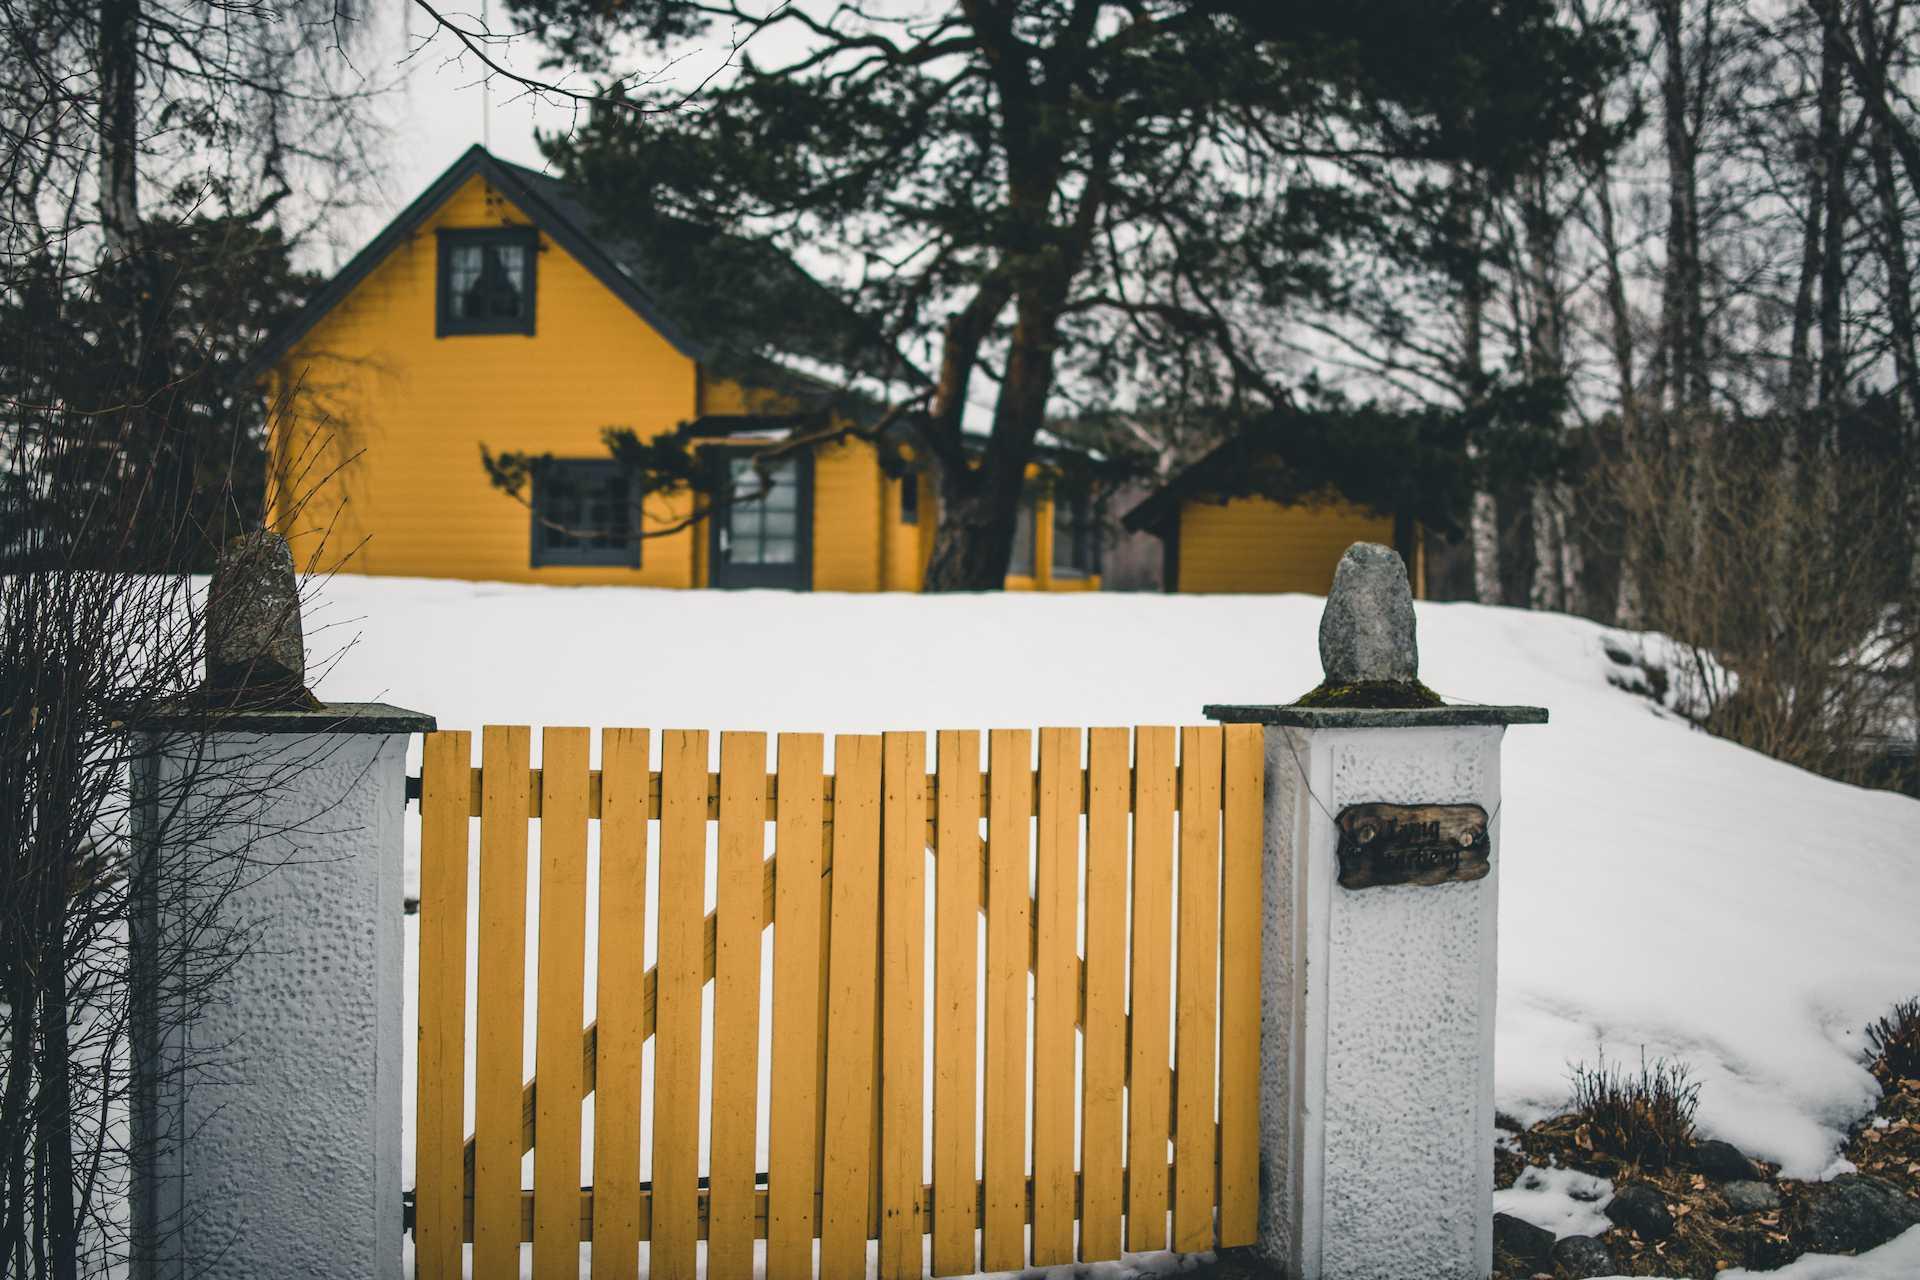 hytty wNorwegii